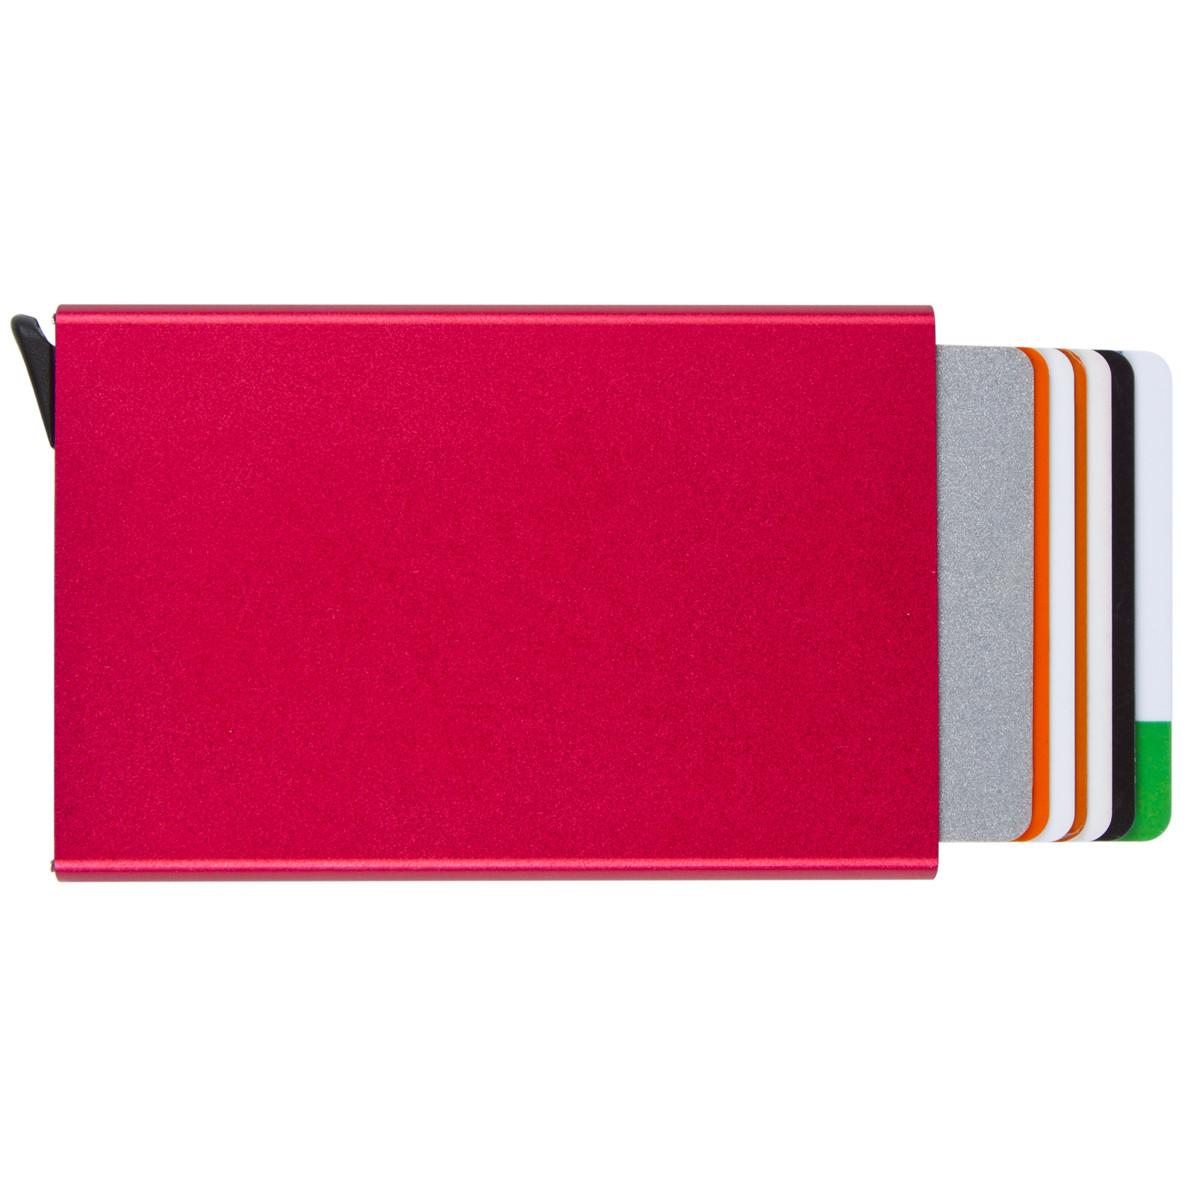 Металлический картхолдер BagHouse 95х62х9 цвет бордовый металлик м КХМбор